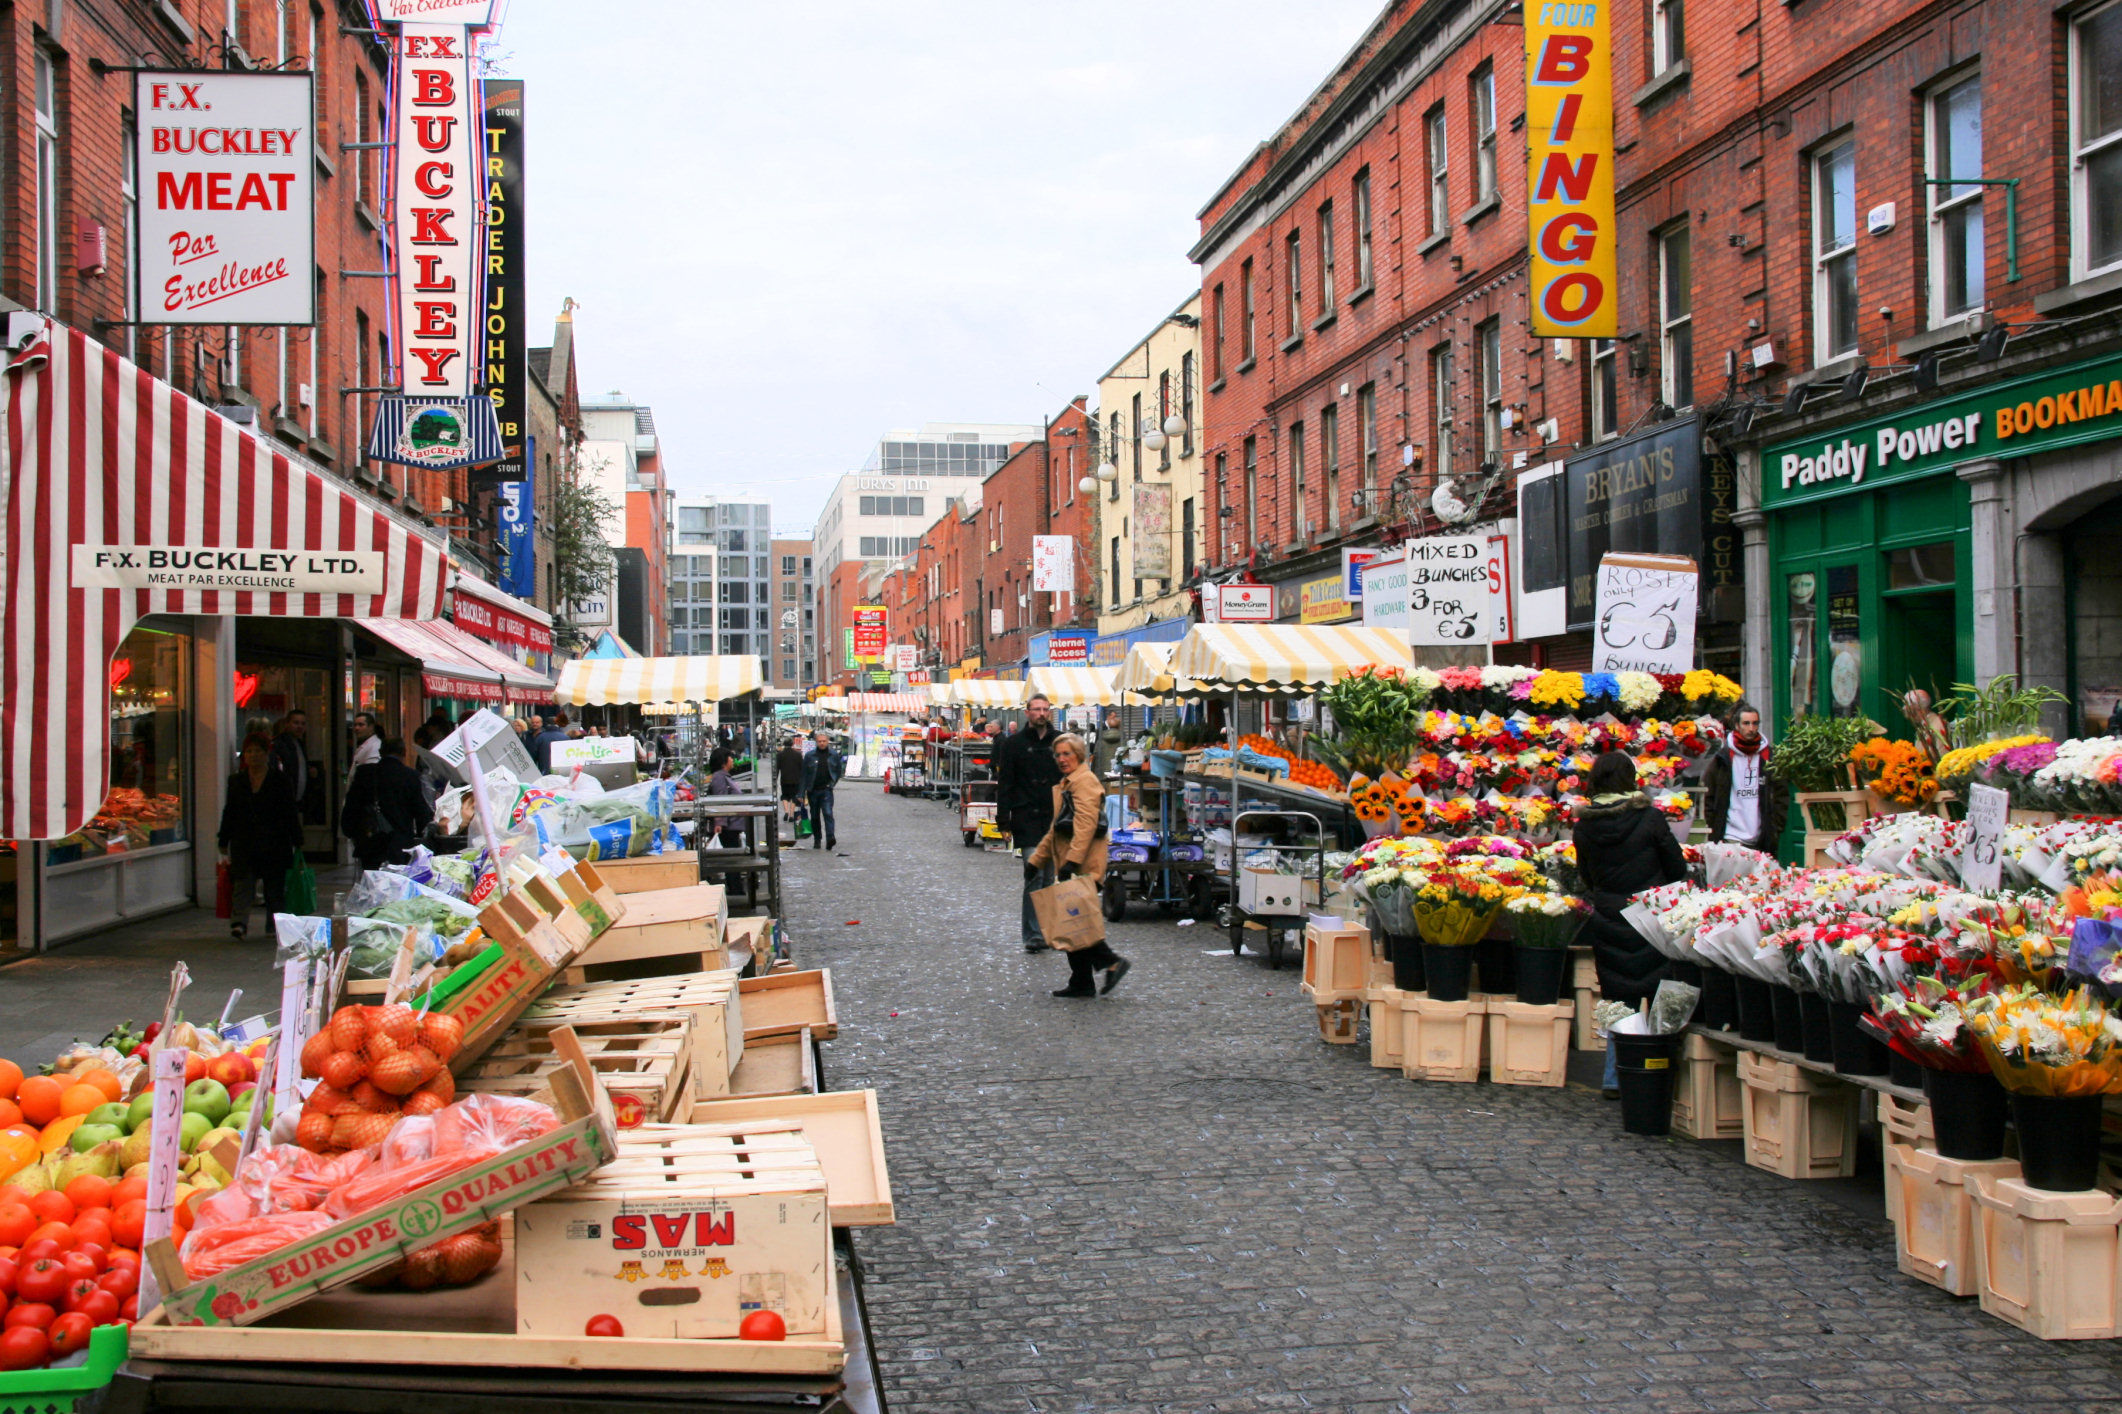 File:Moore Street market, Dublin.jpg - Wikimedia Commons